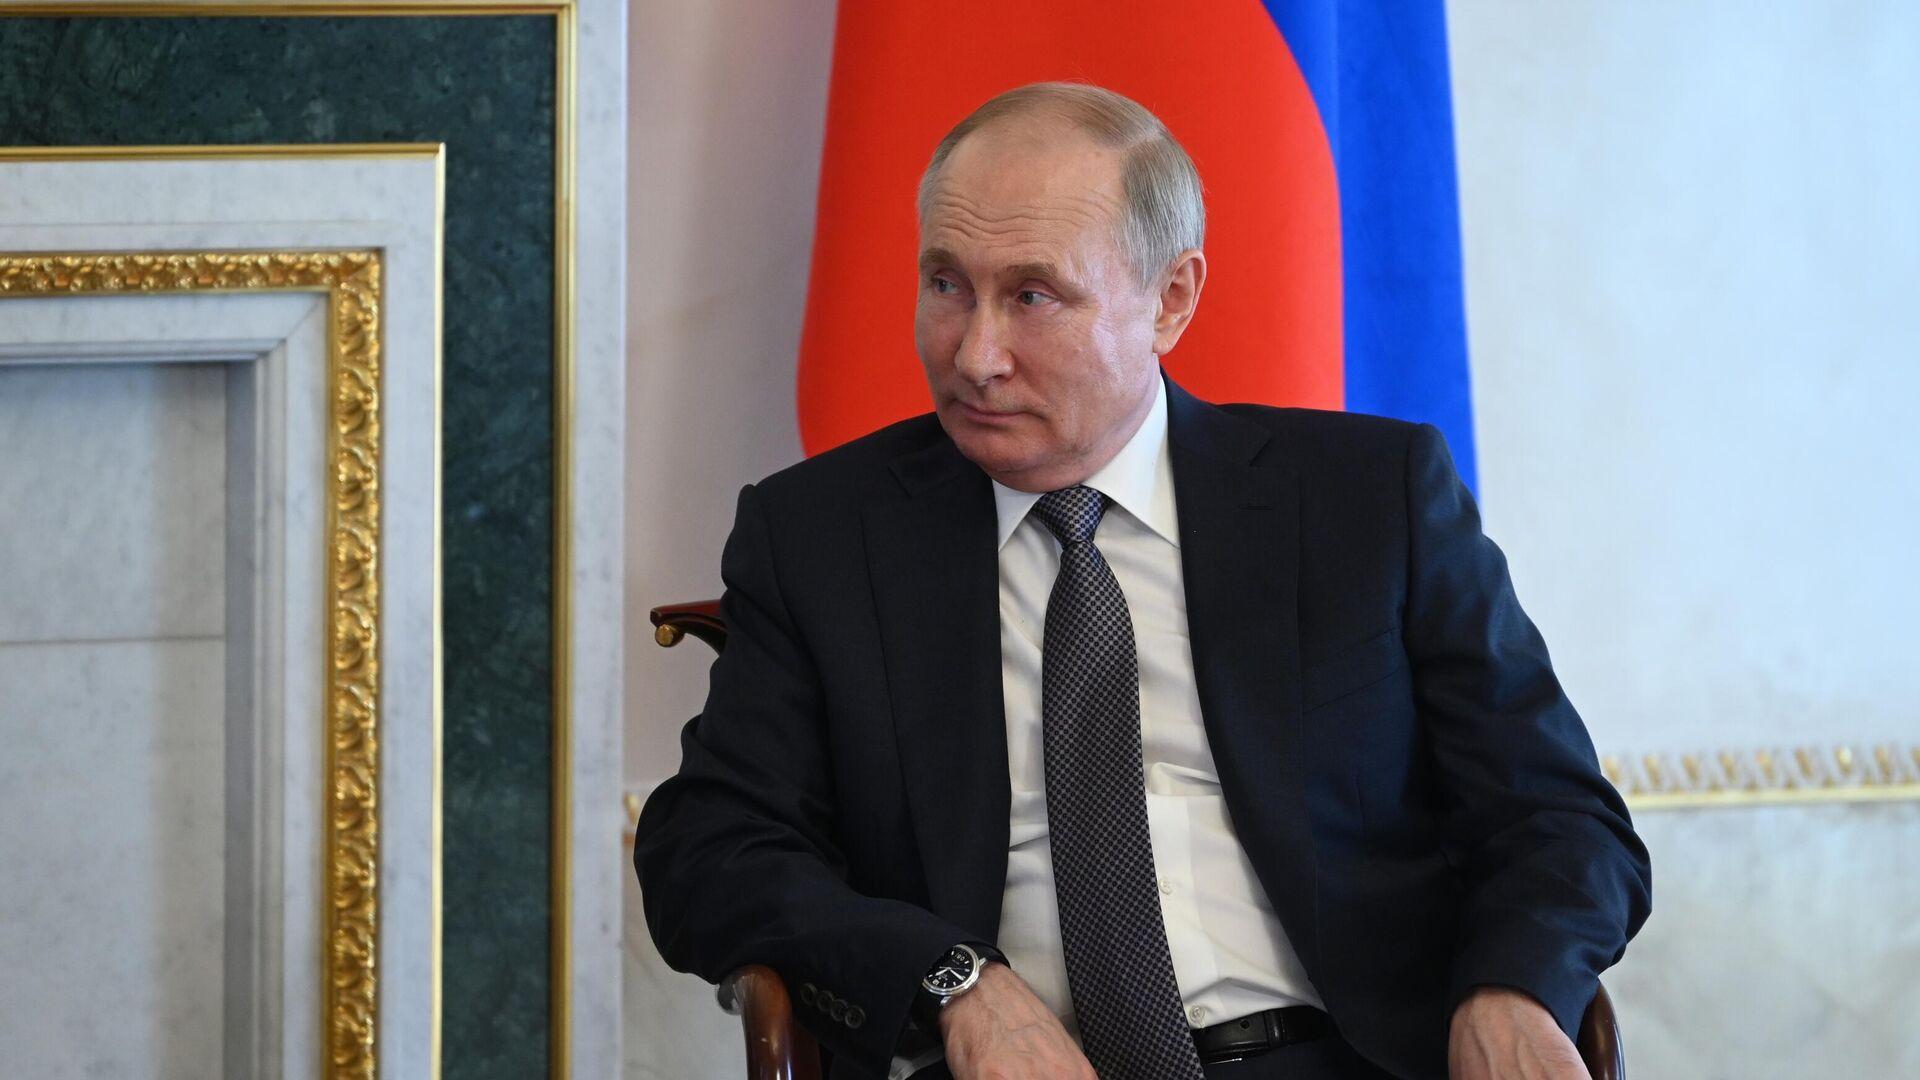 Президент РФ Владимир Путин во время встречи с президентом Белоруссии Александром Лукашенко - РИА Новости, 1920, 22.07.2021